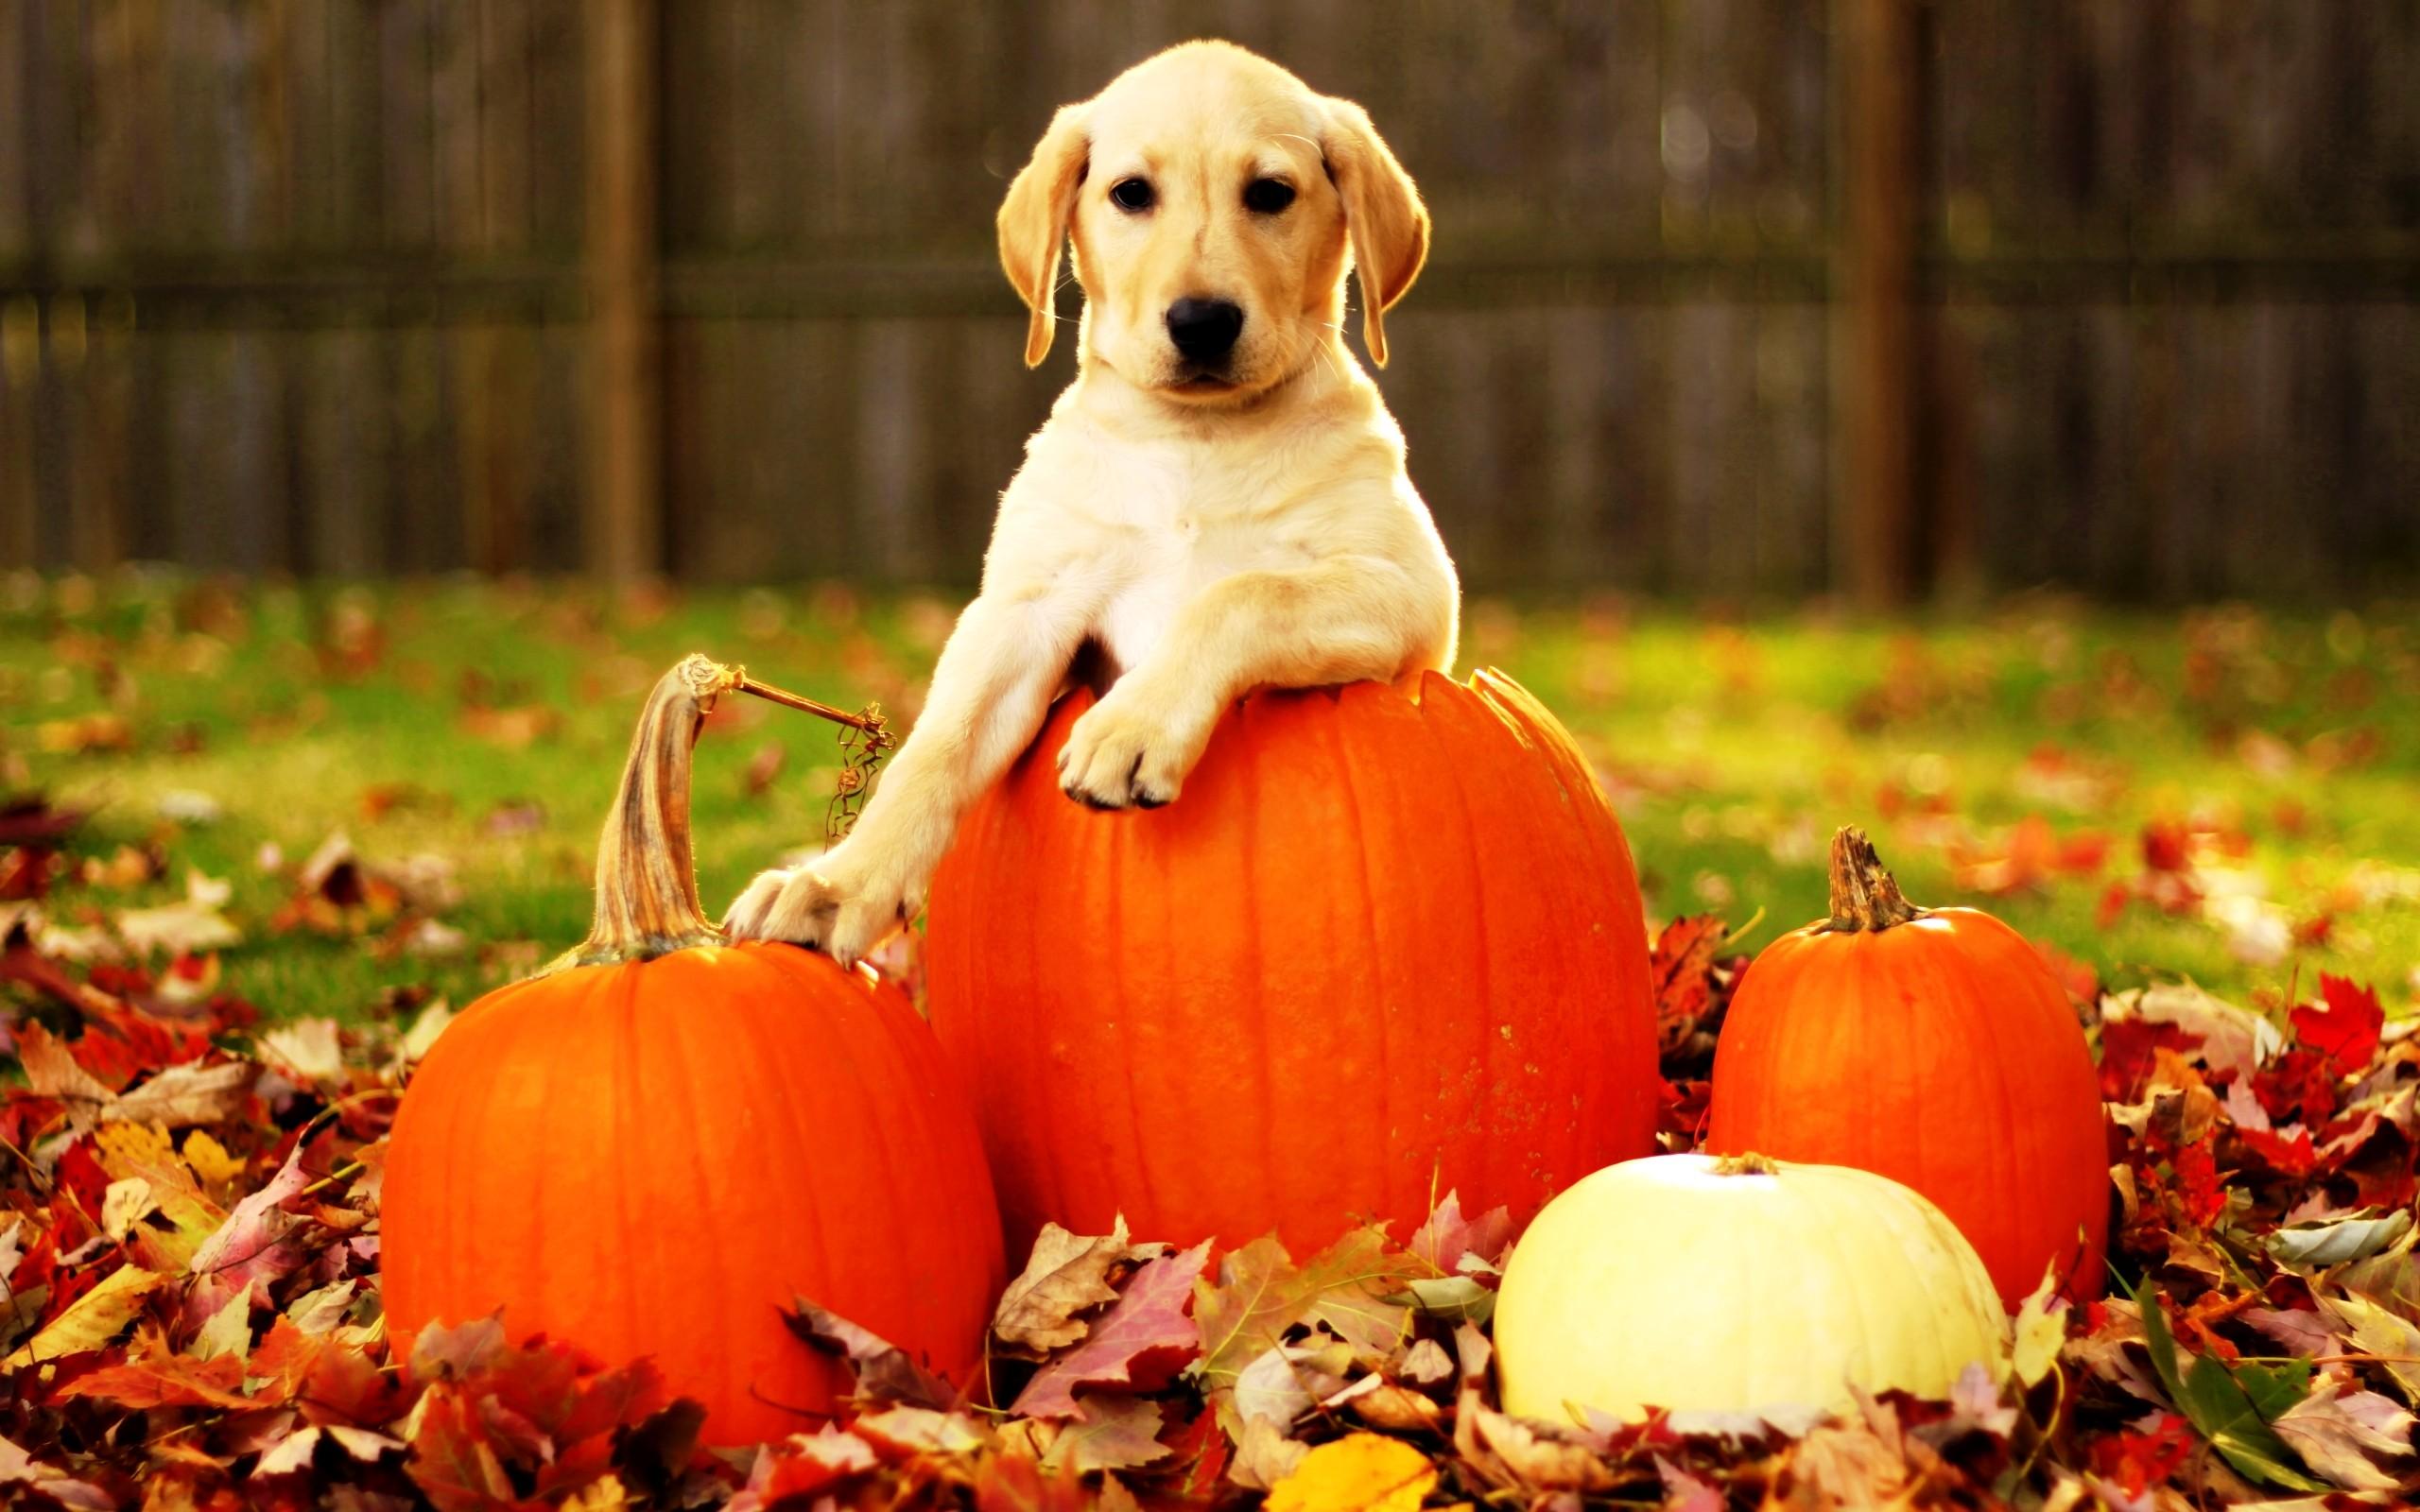 Free Dog Screensaver And Wallpaper : Free Dog Screensaver and Wallpaper Dog  on the Pumpkins